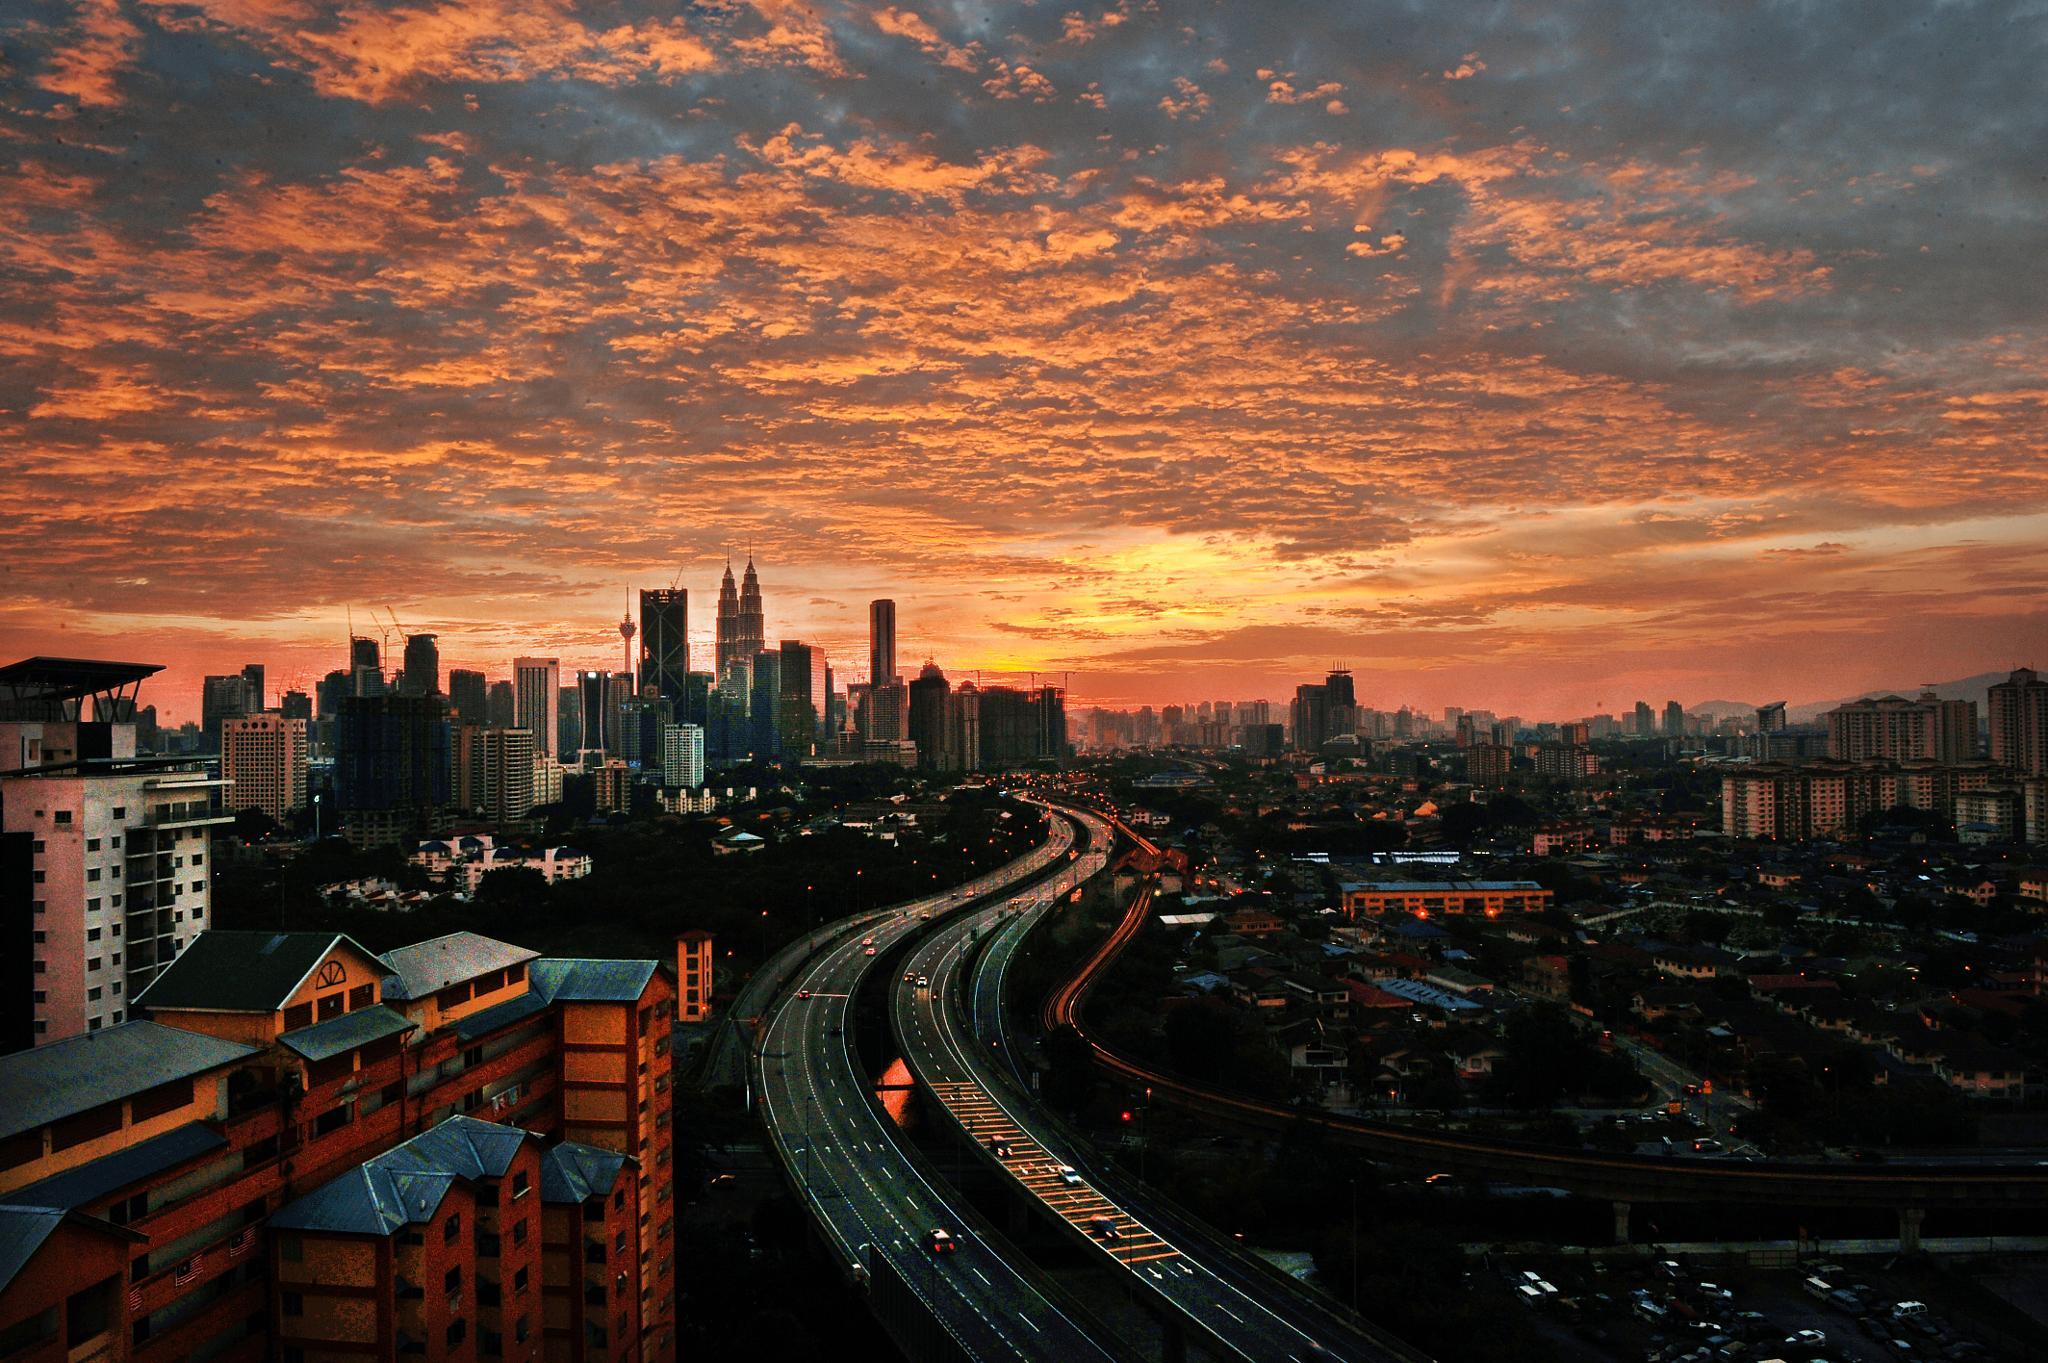 KL Sunset II by babul.abdullah